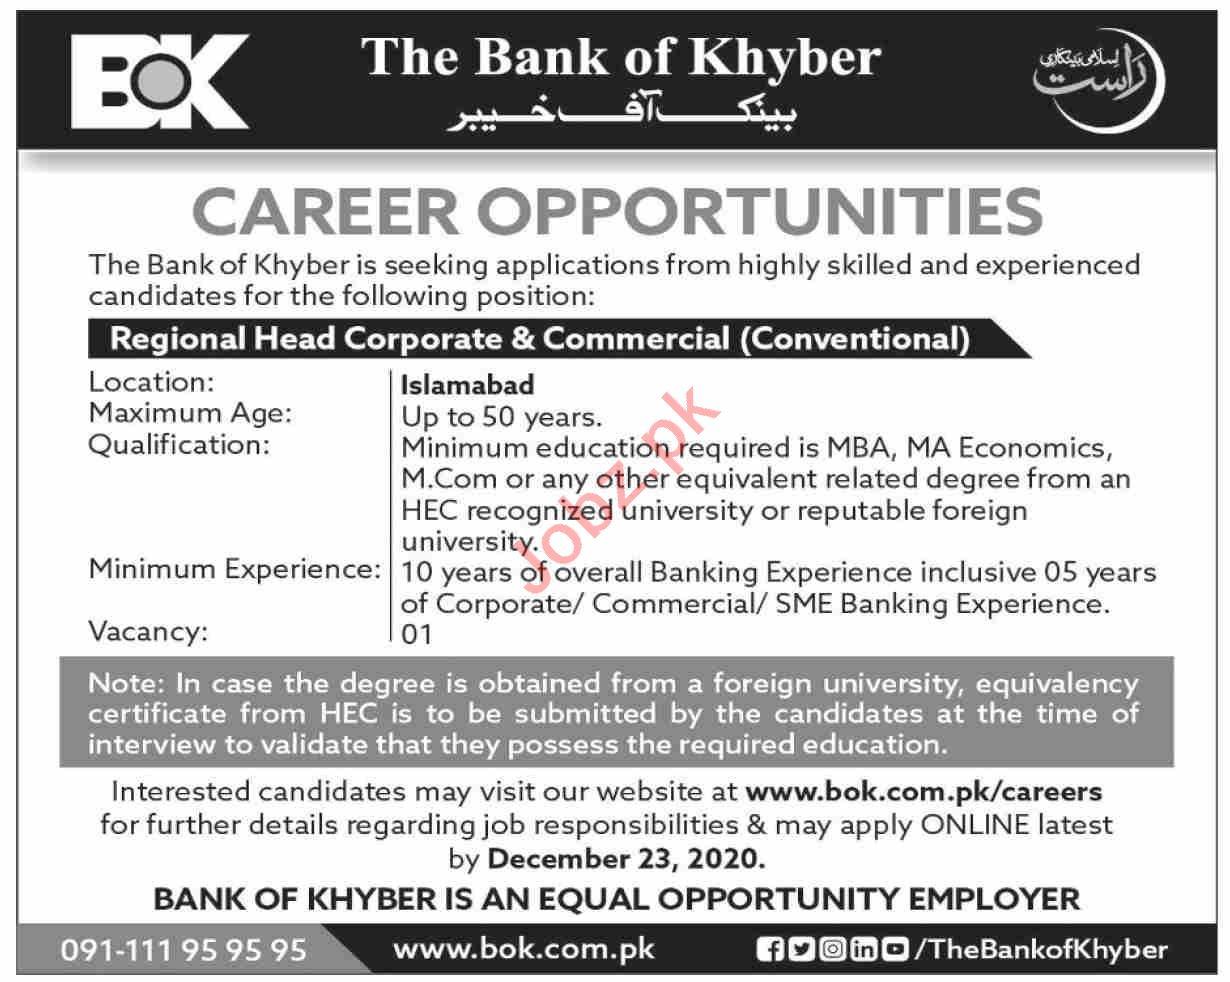 Regional Head Corporate Jobs 2020 in The Bank of Khyber BOK